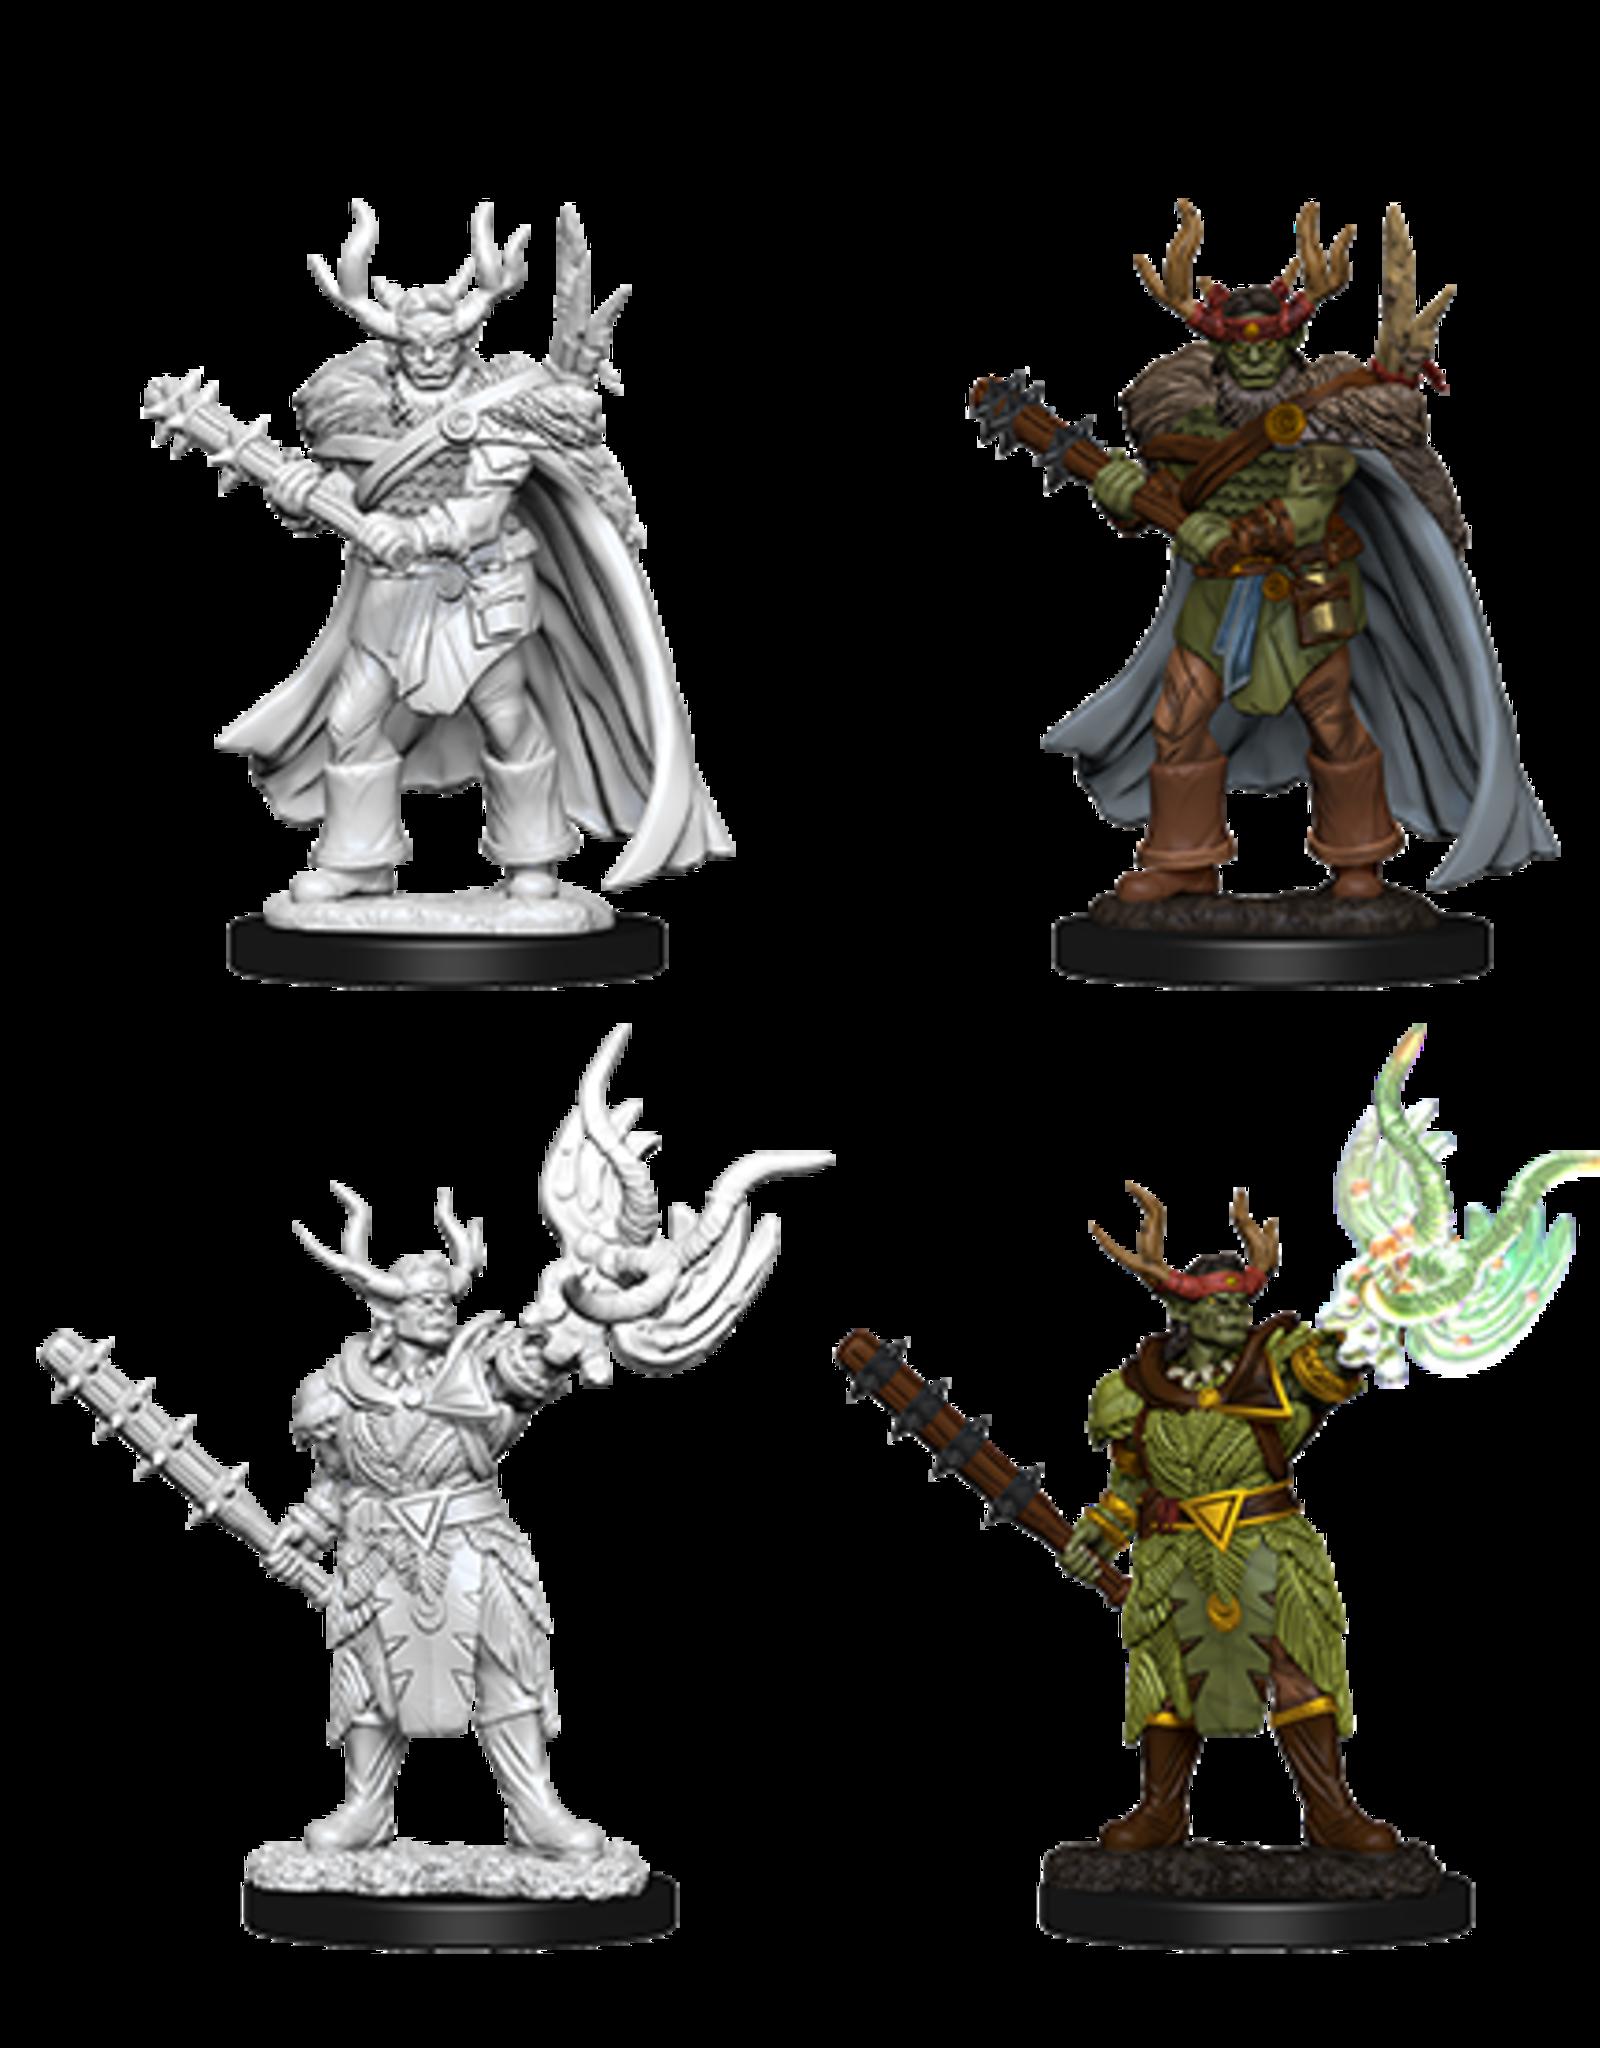 Wizkids Pathfinder Deep Cuts: Male Half-Orc Druid